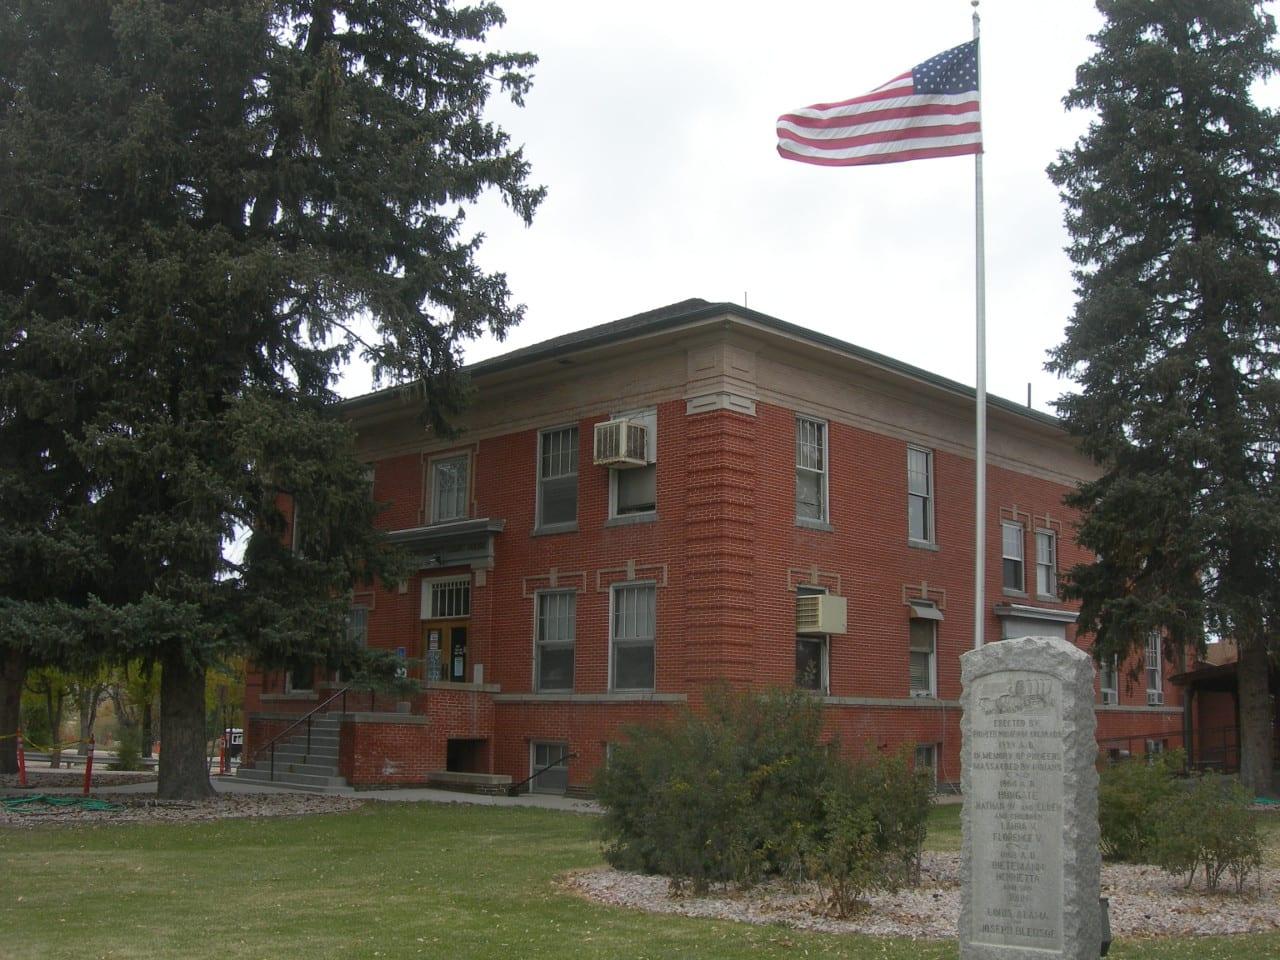 Former Elbert County Courthouse Kiowa Colorado